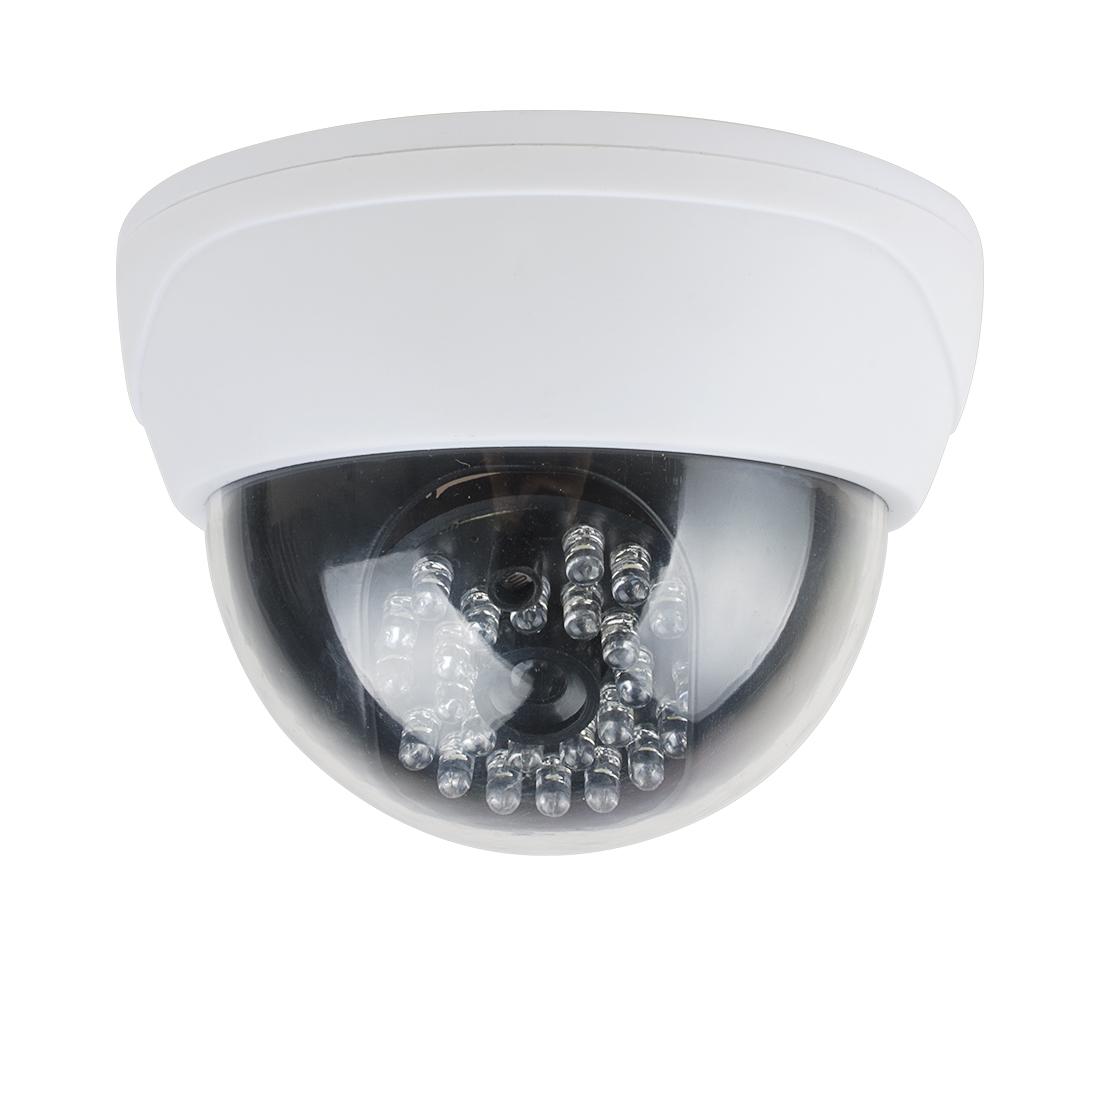 Fake Dummy Realistic Looking Security Camera Light Sensor AA Battery Powered